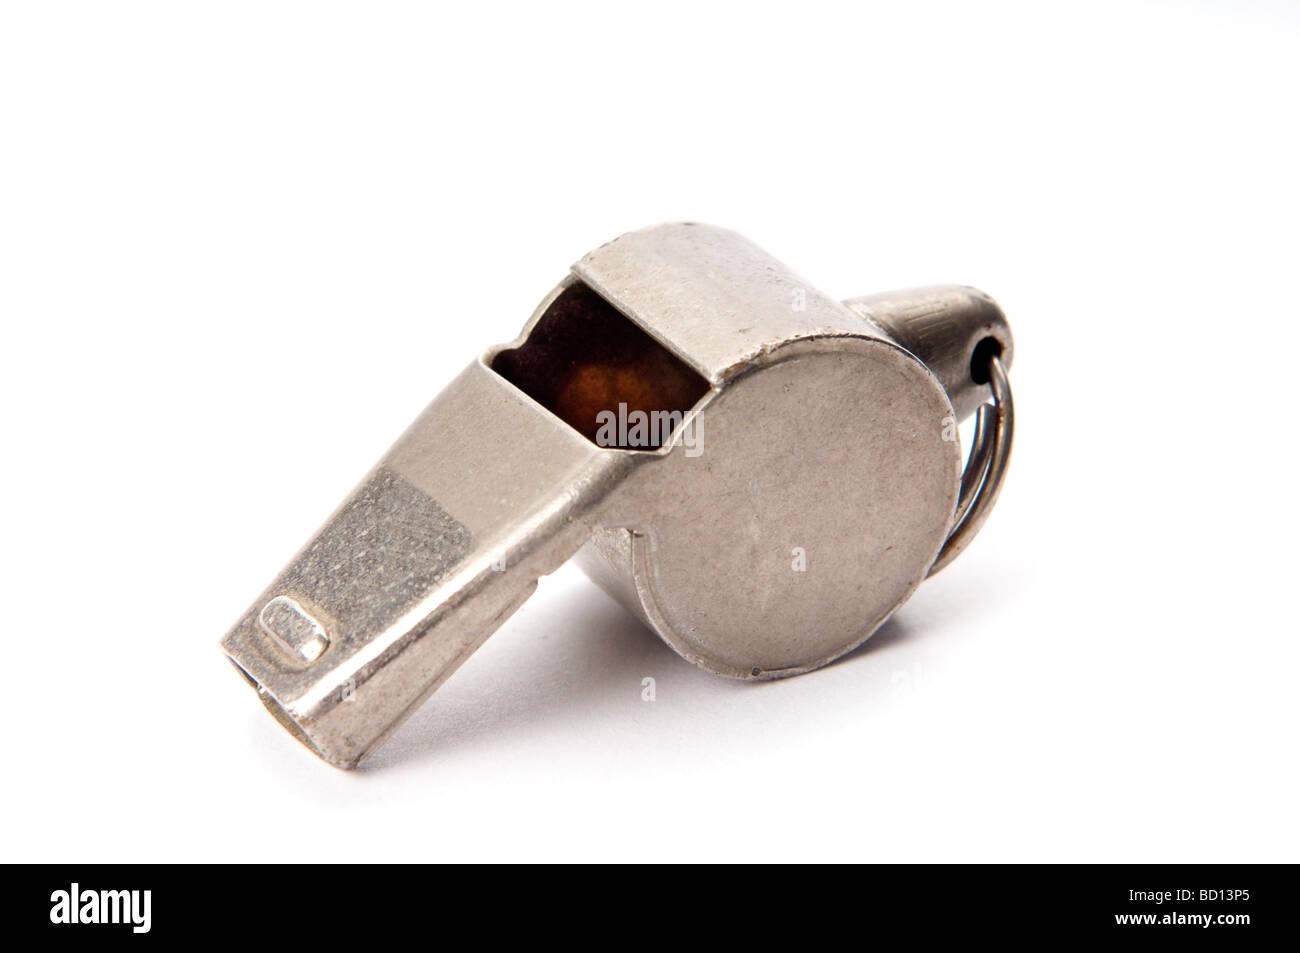 old whistle on white - Stock Image